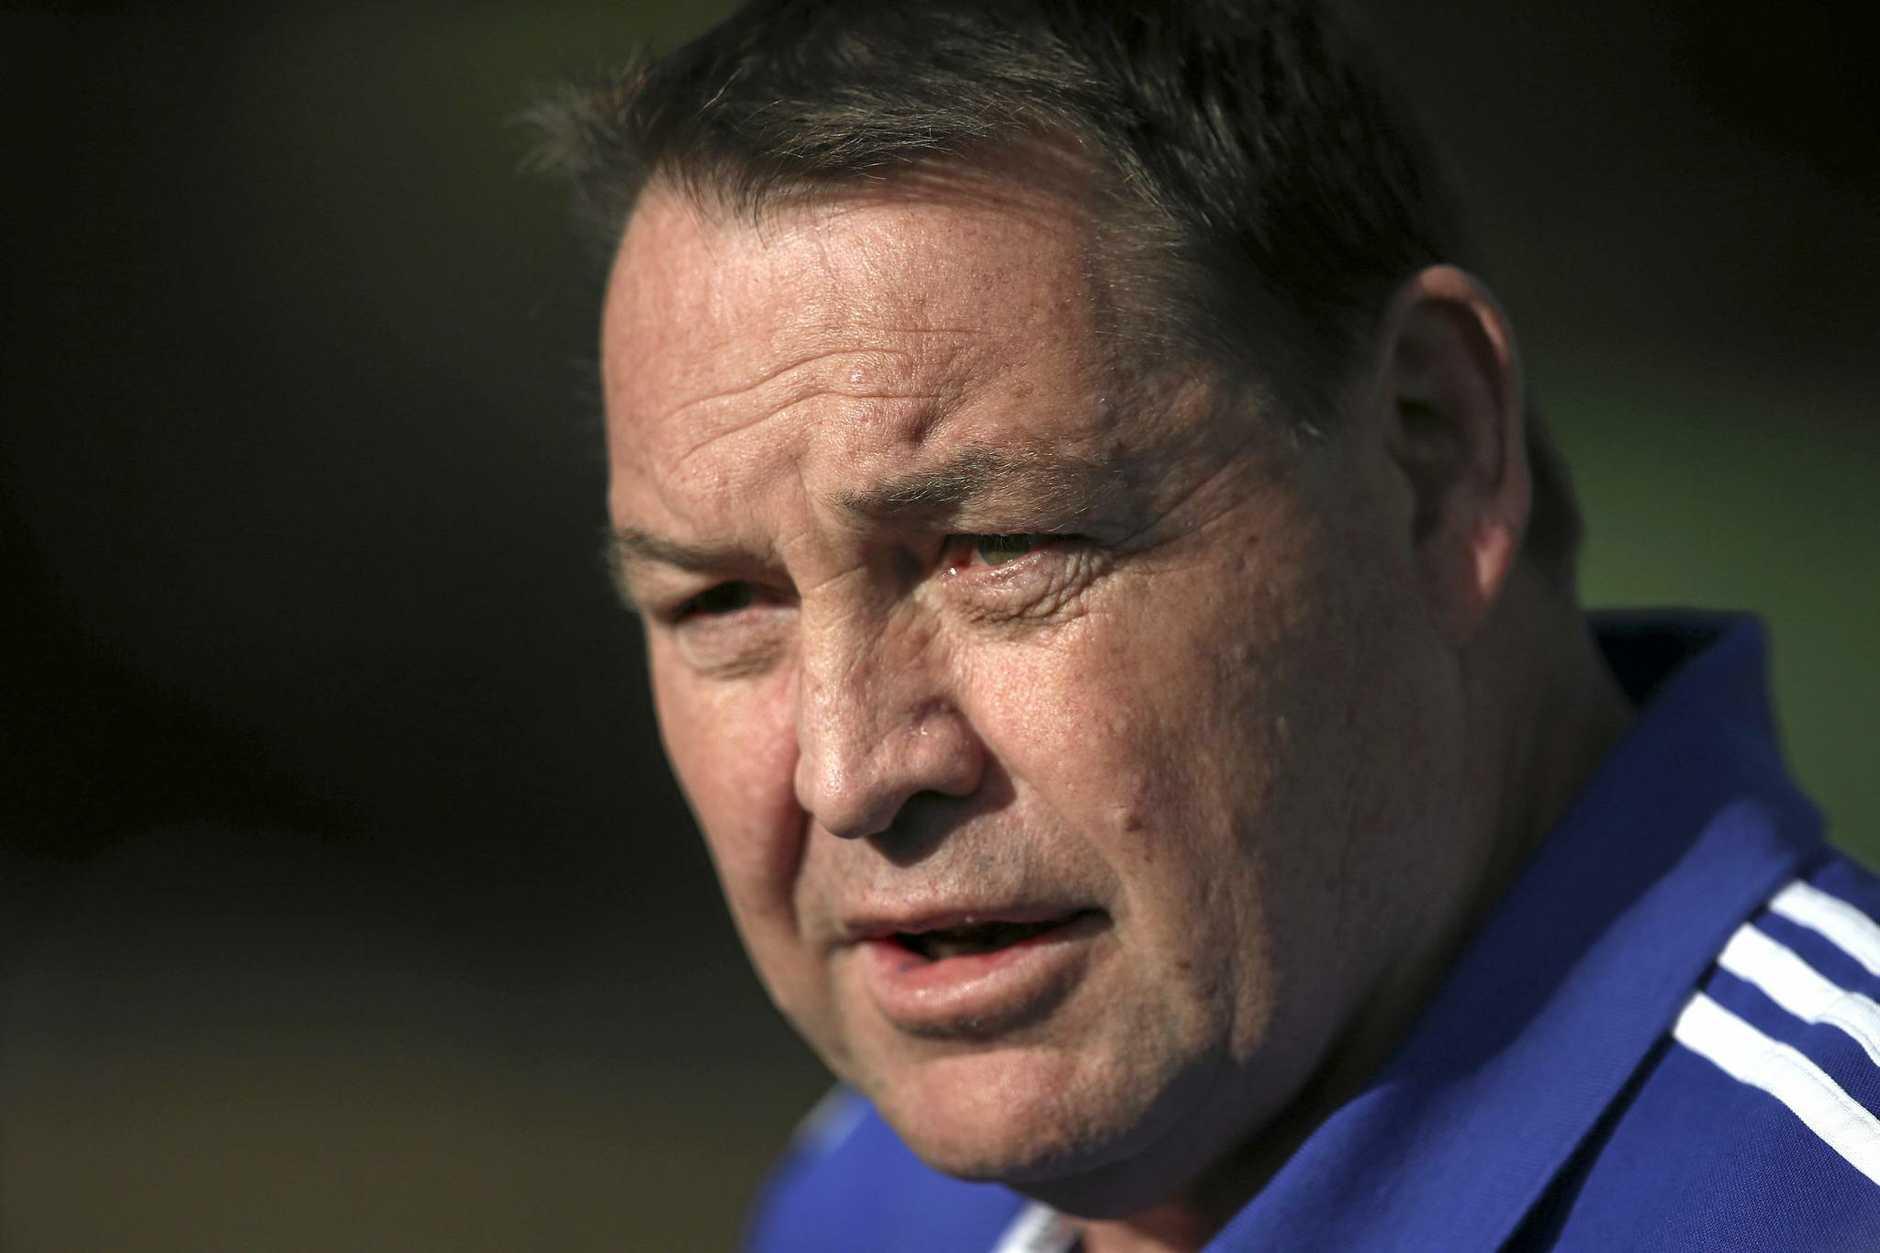 New Zealand rugby union head coach Steve Hansen looks on as his team trains.